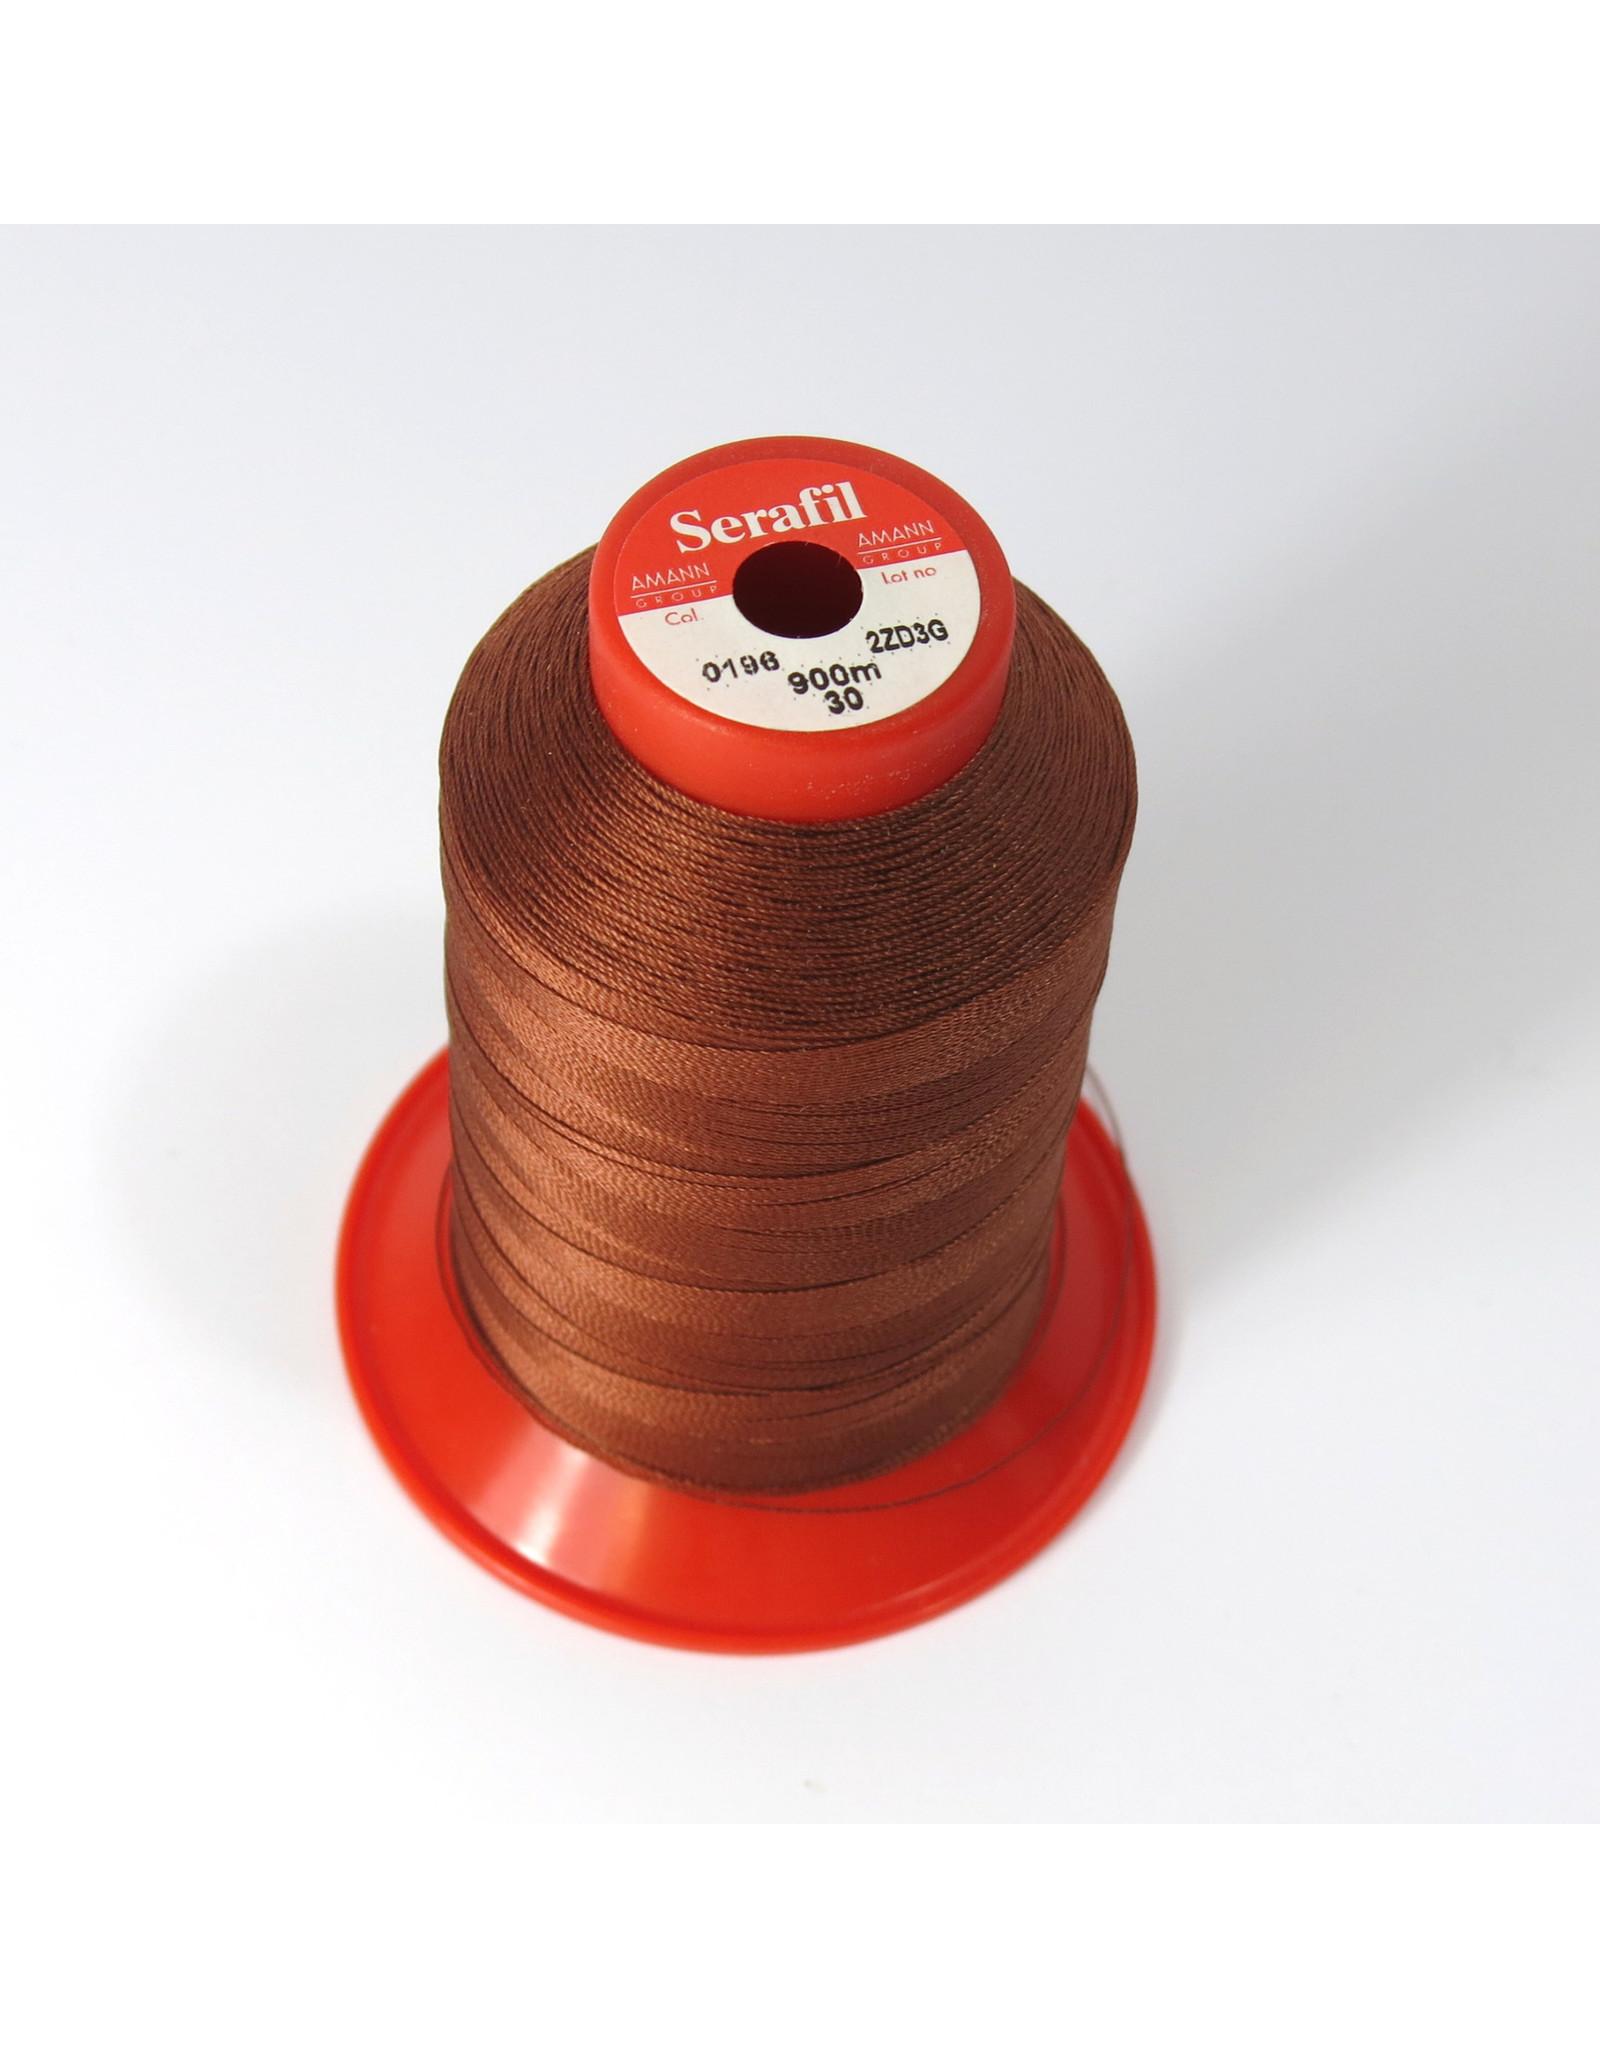 Serafil machine sewing threads 0196